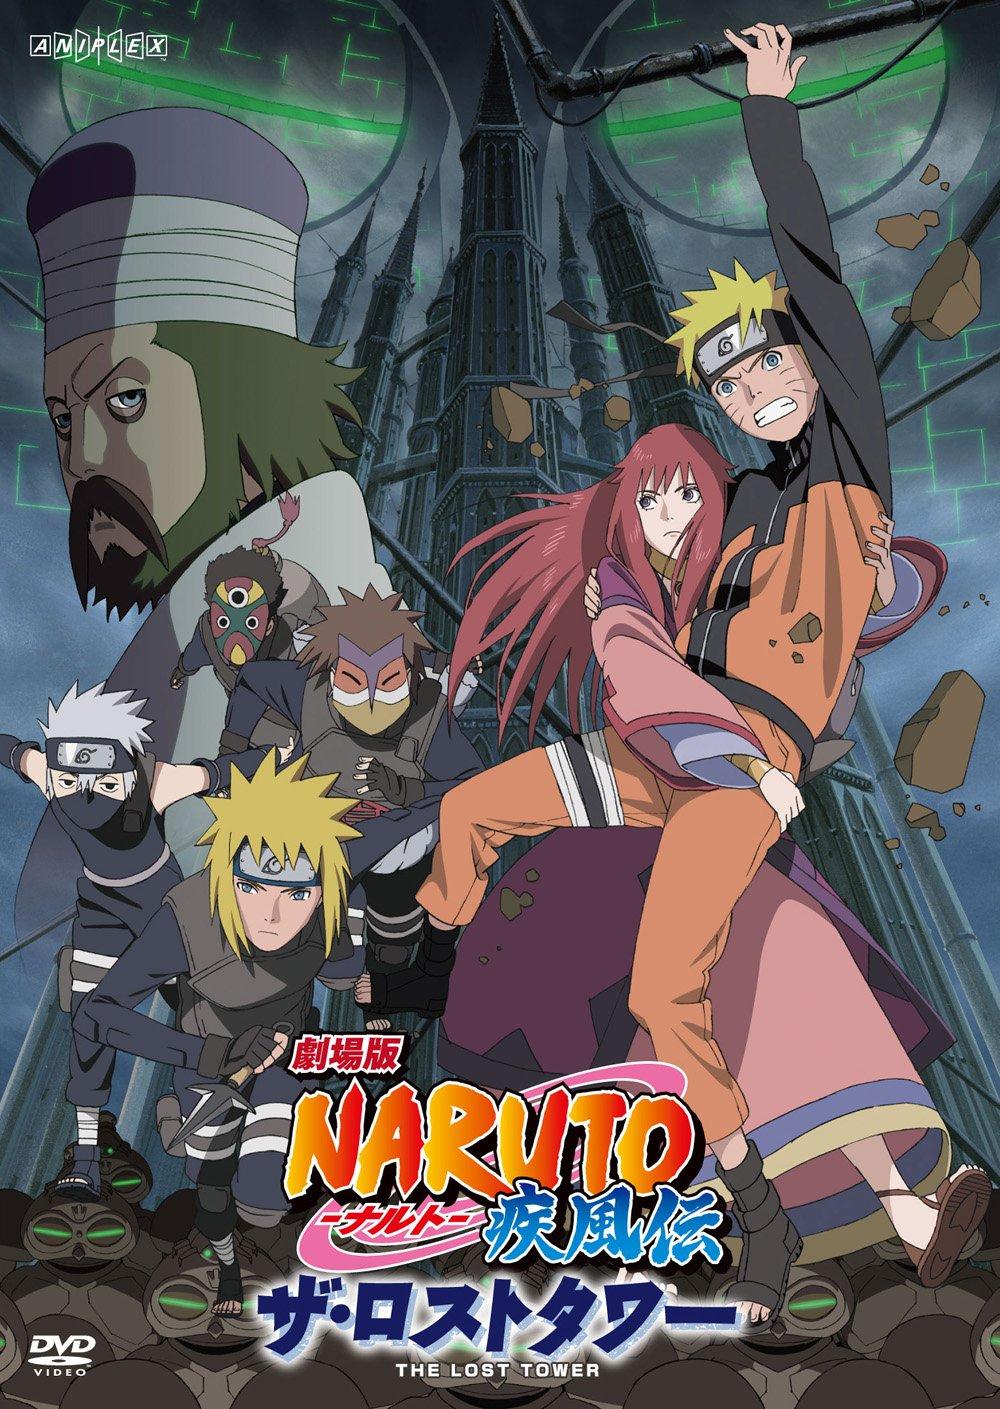 Amazon.com: Gekijyouban NARUTO--sippuden The lost tower ...